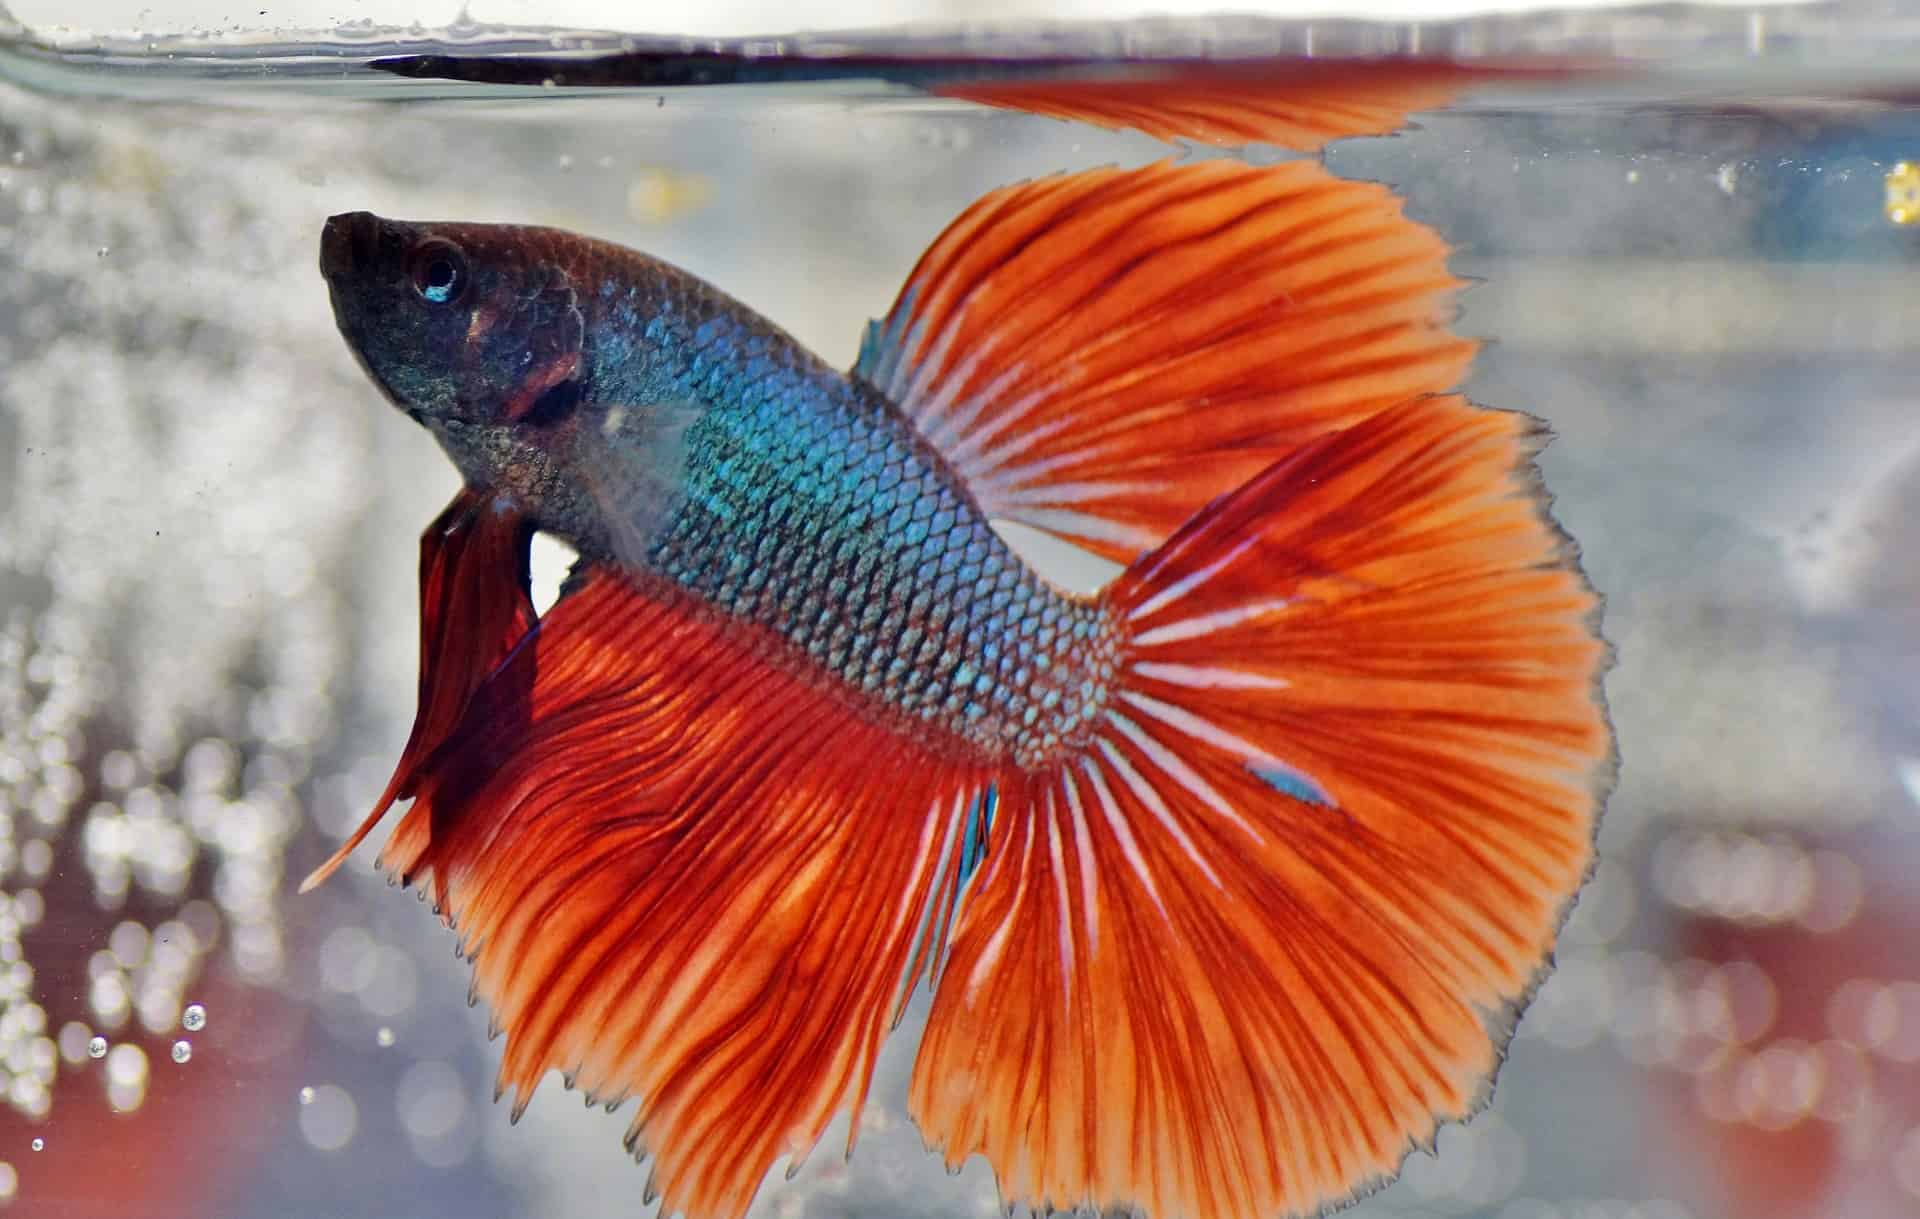 Aquarium Fish: Know More About It